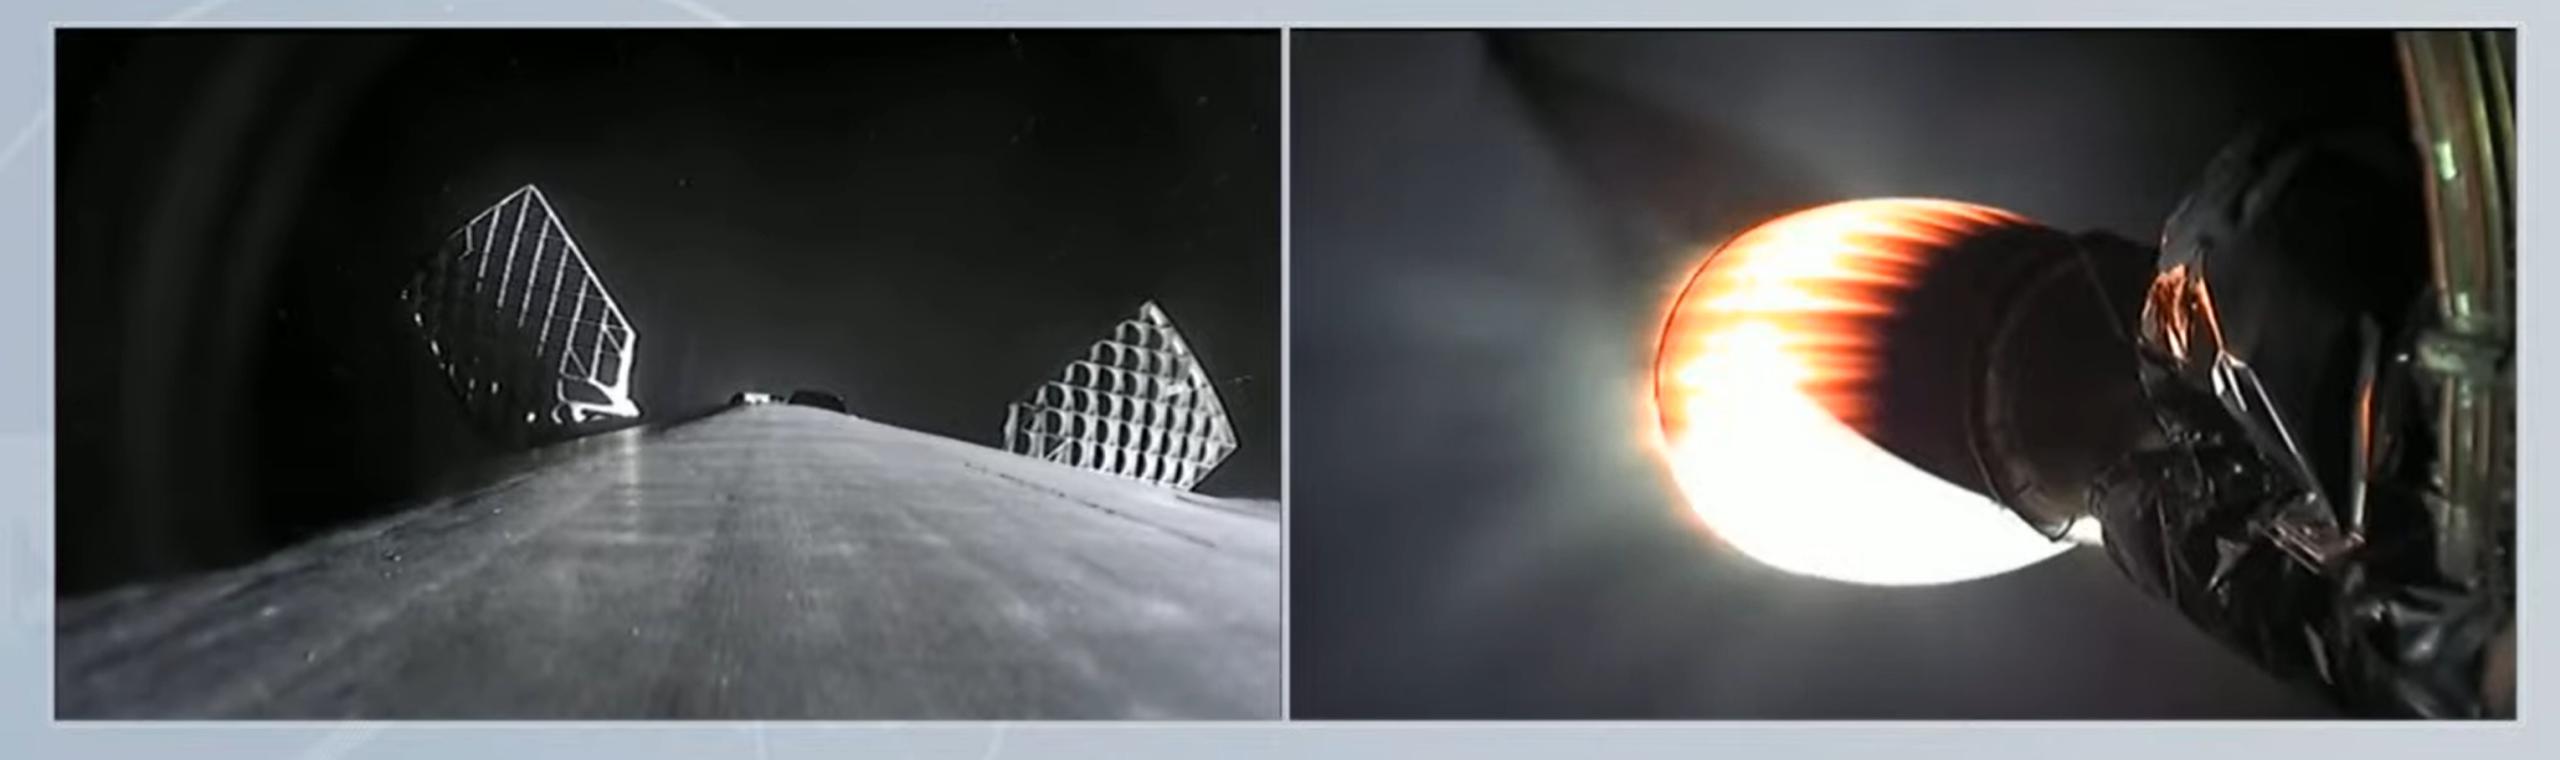 Crew-2 Crew Dragon C206 Falcon 9 B1061 042321 webcast (SpaceX) launch 7 (c)